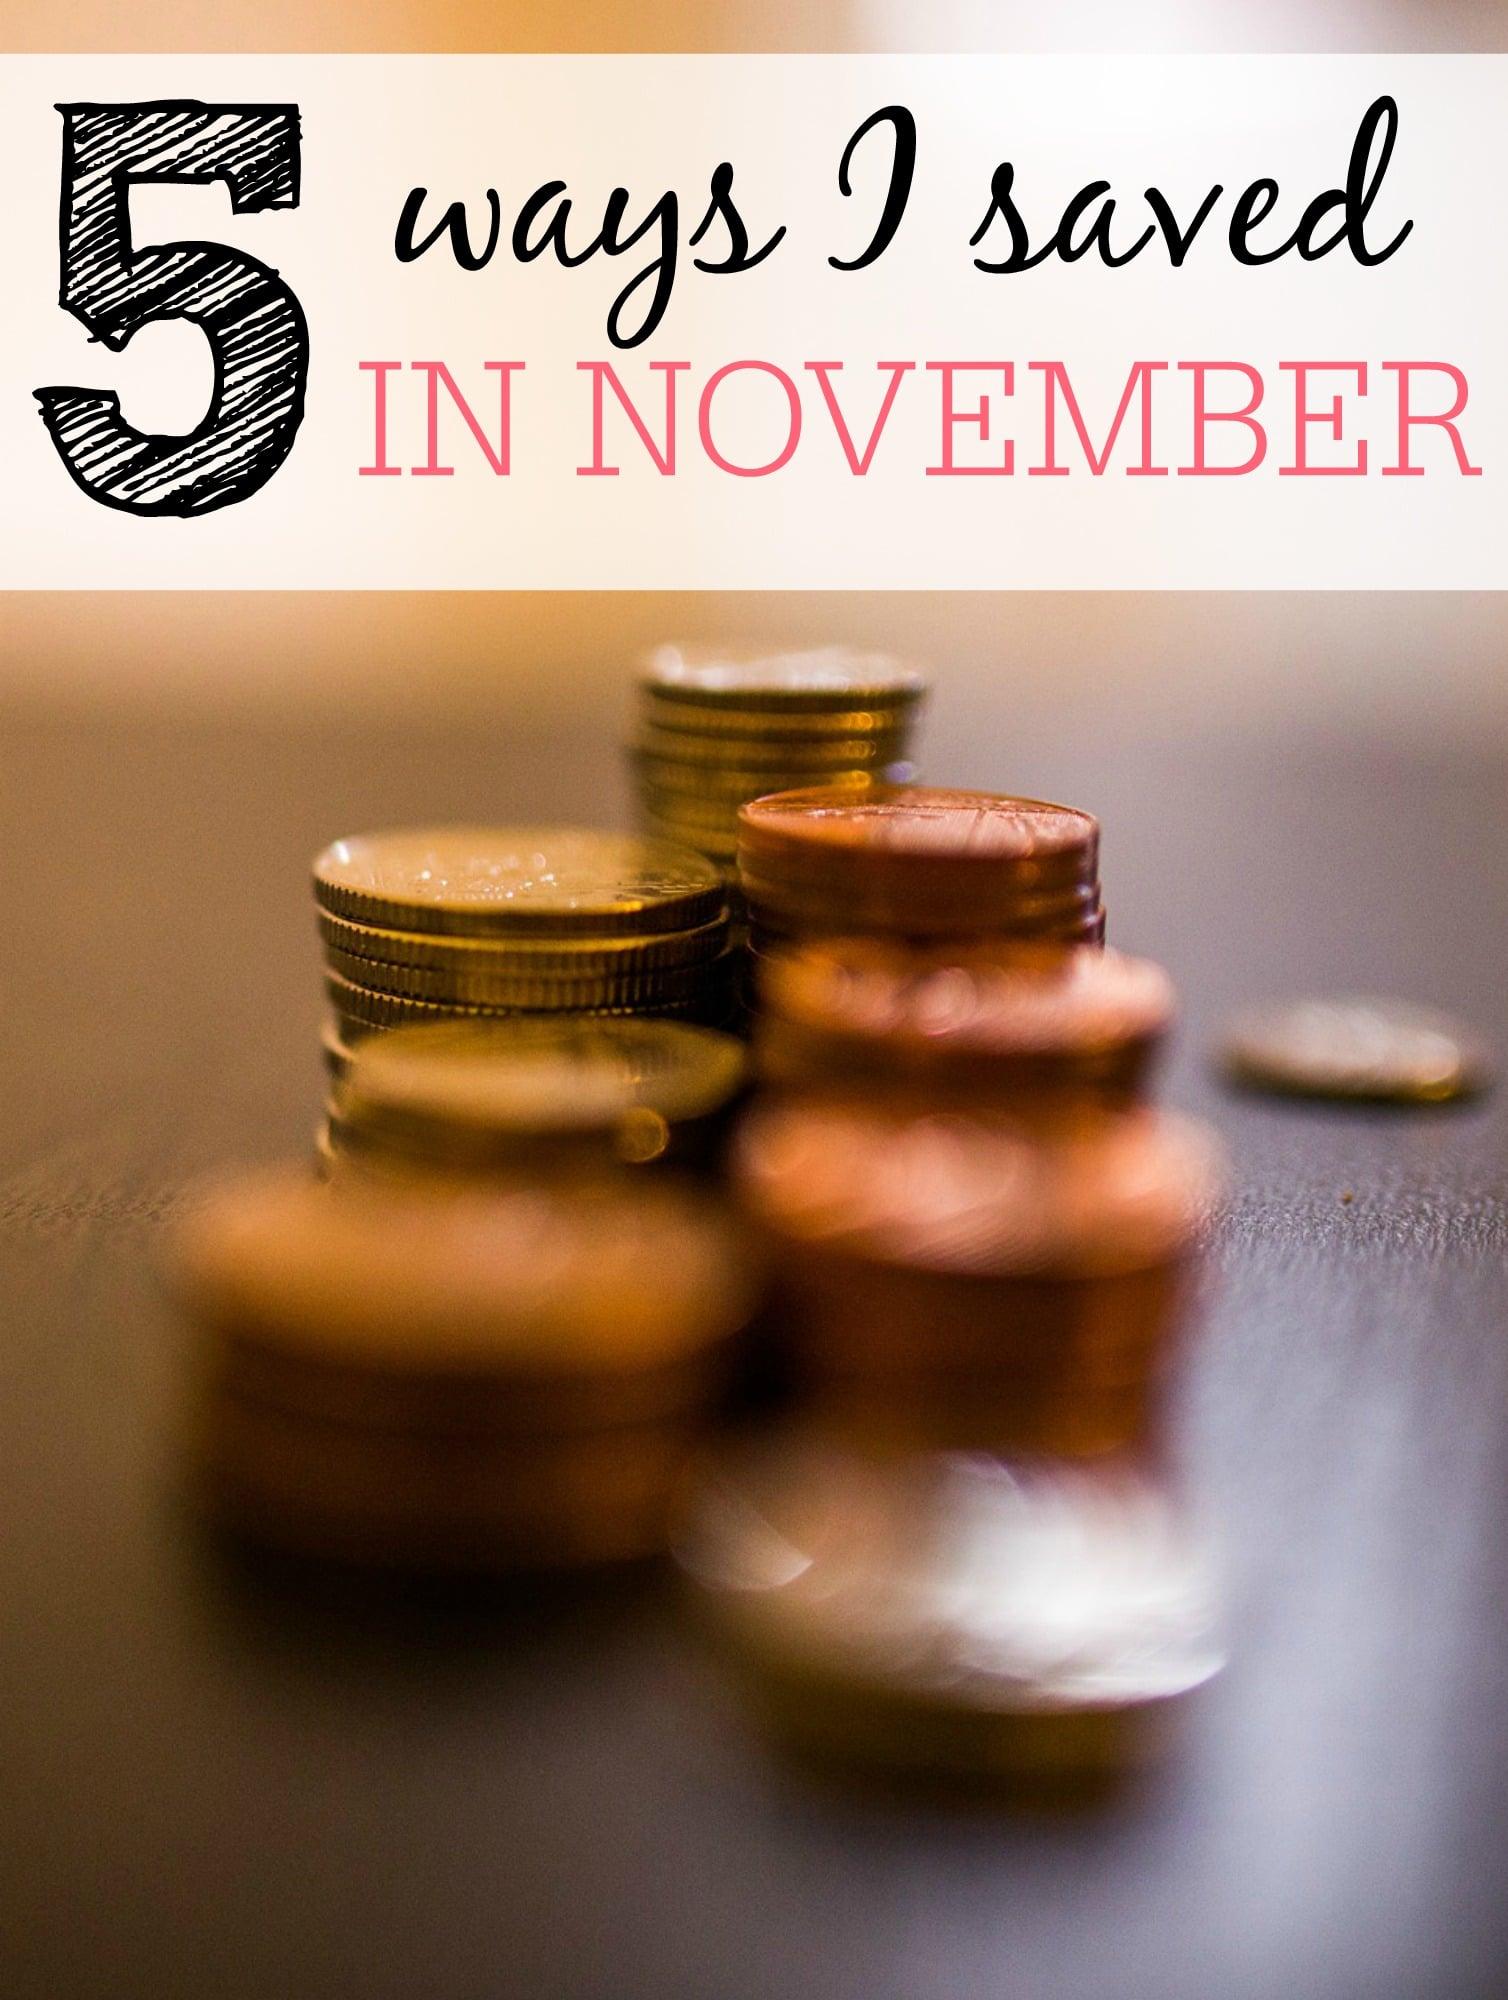 5 Ways I Saved In November